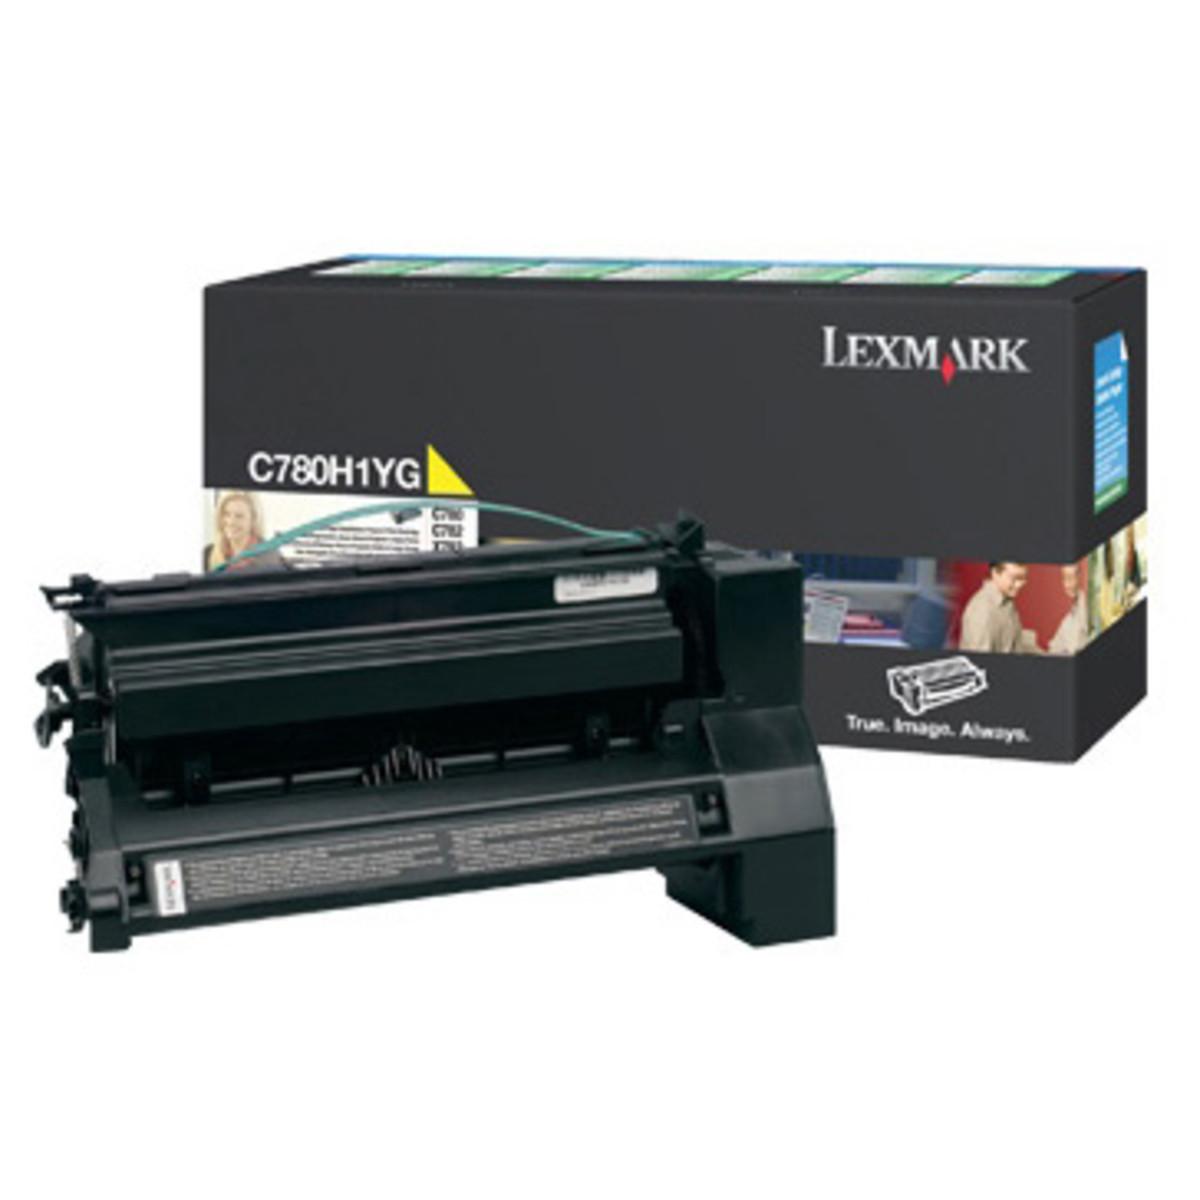 Lexmark C780H1YG Yellow Toner Cartridge- High Yield